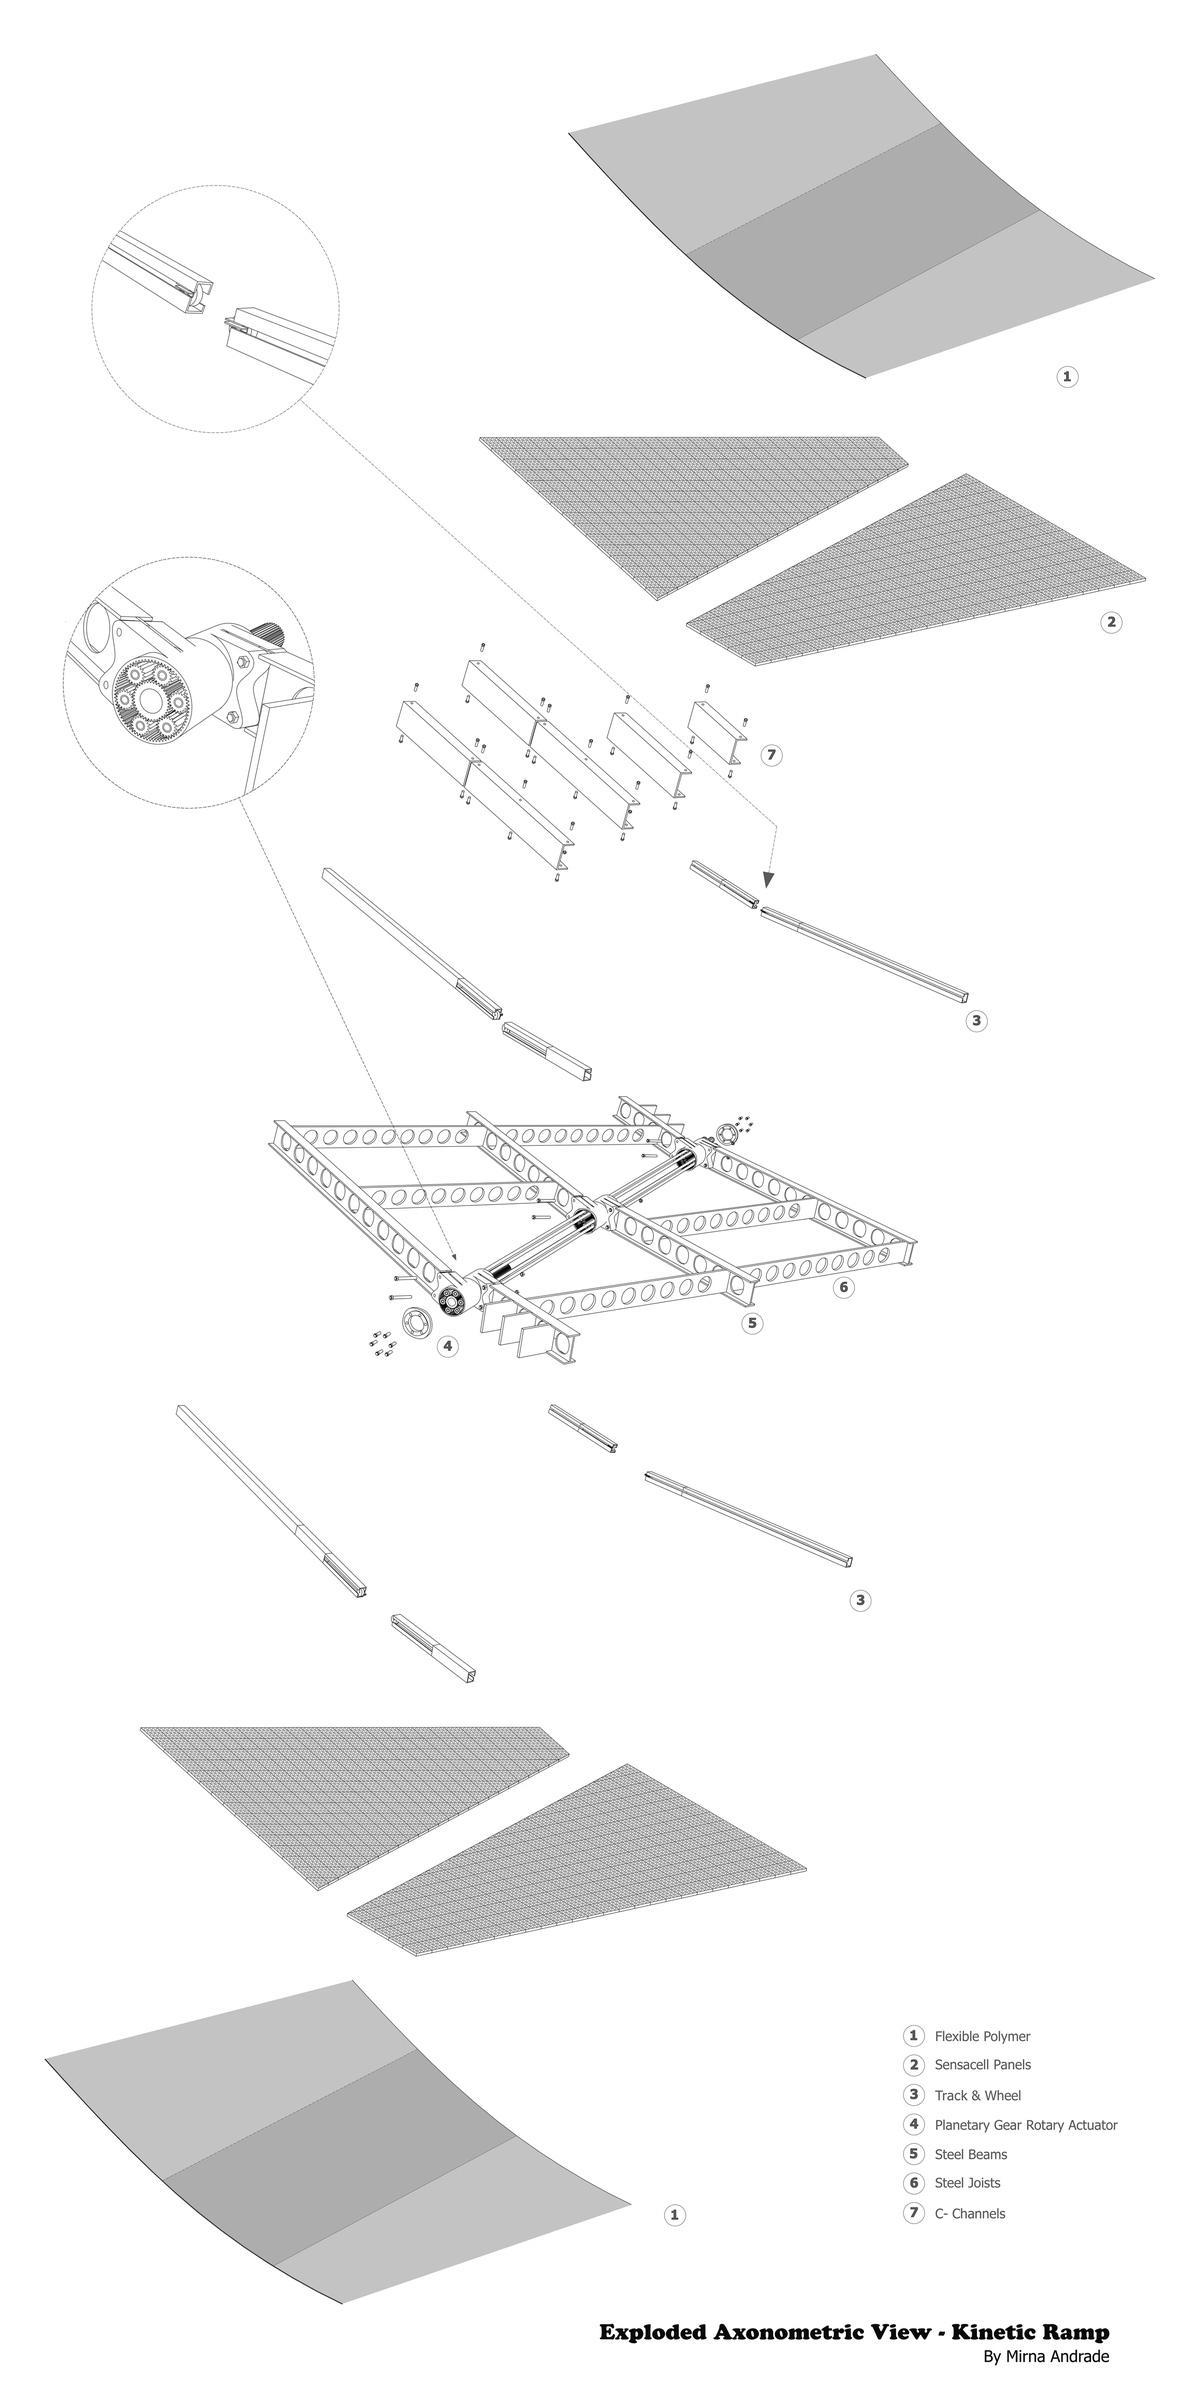 Axon of the kinetic prototype for ramp